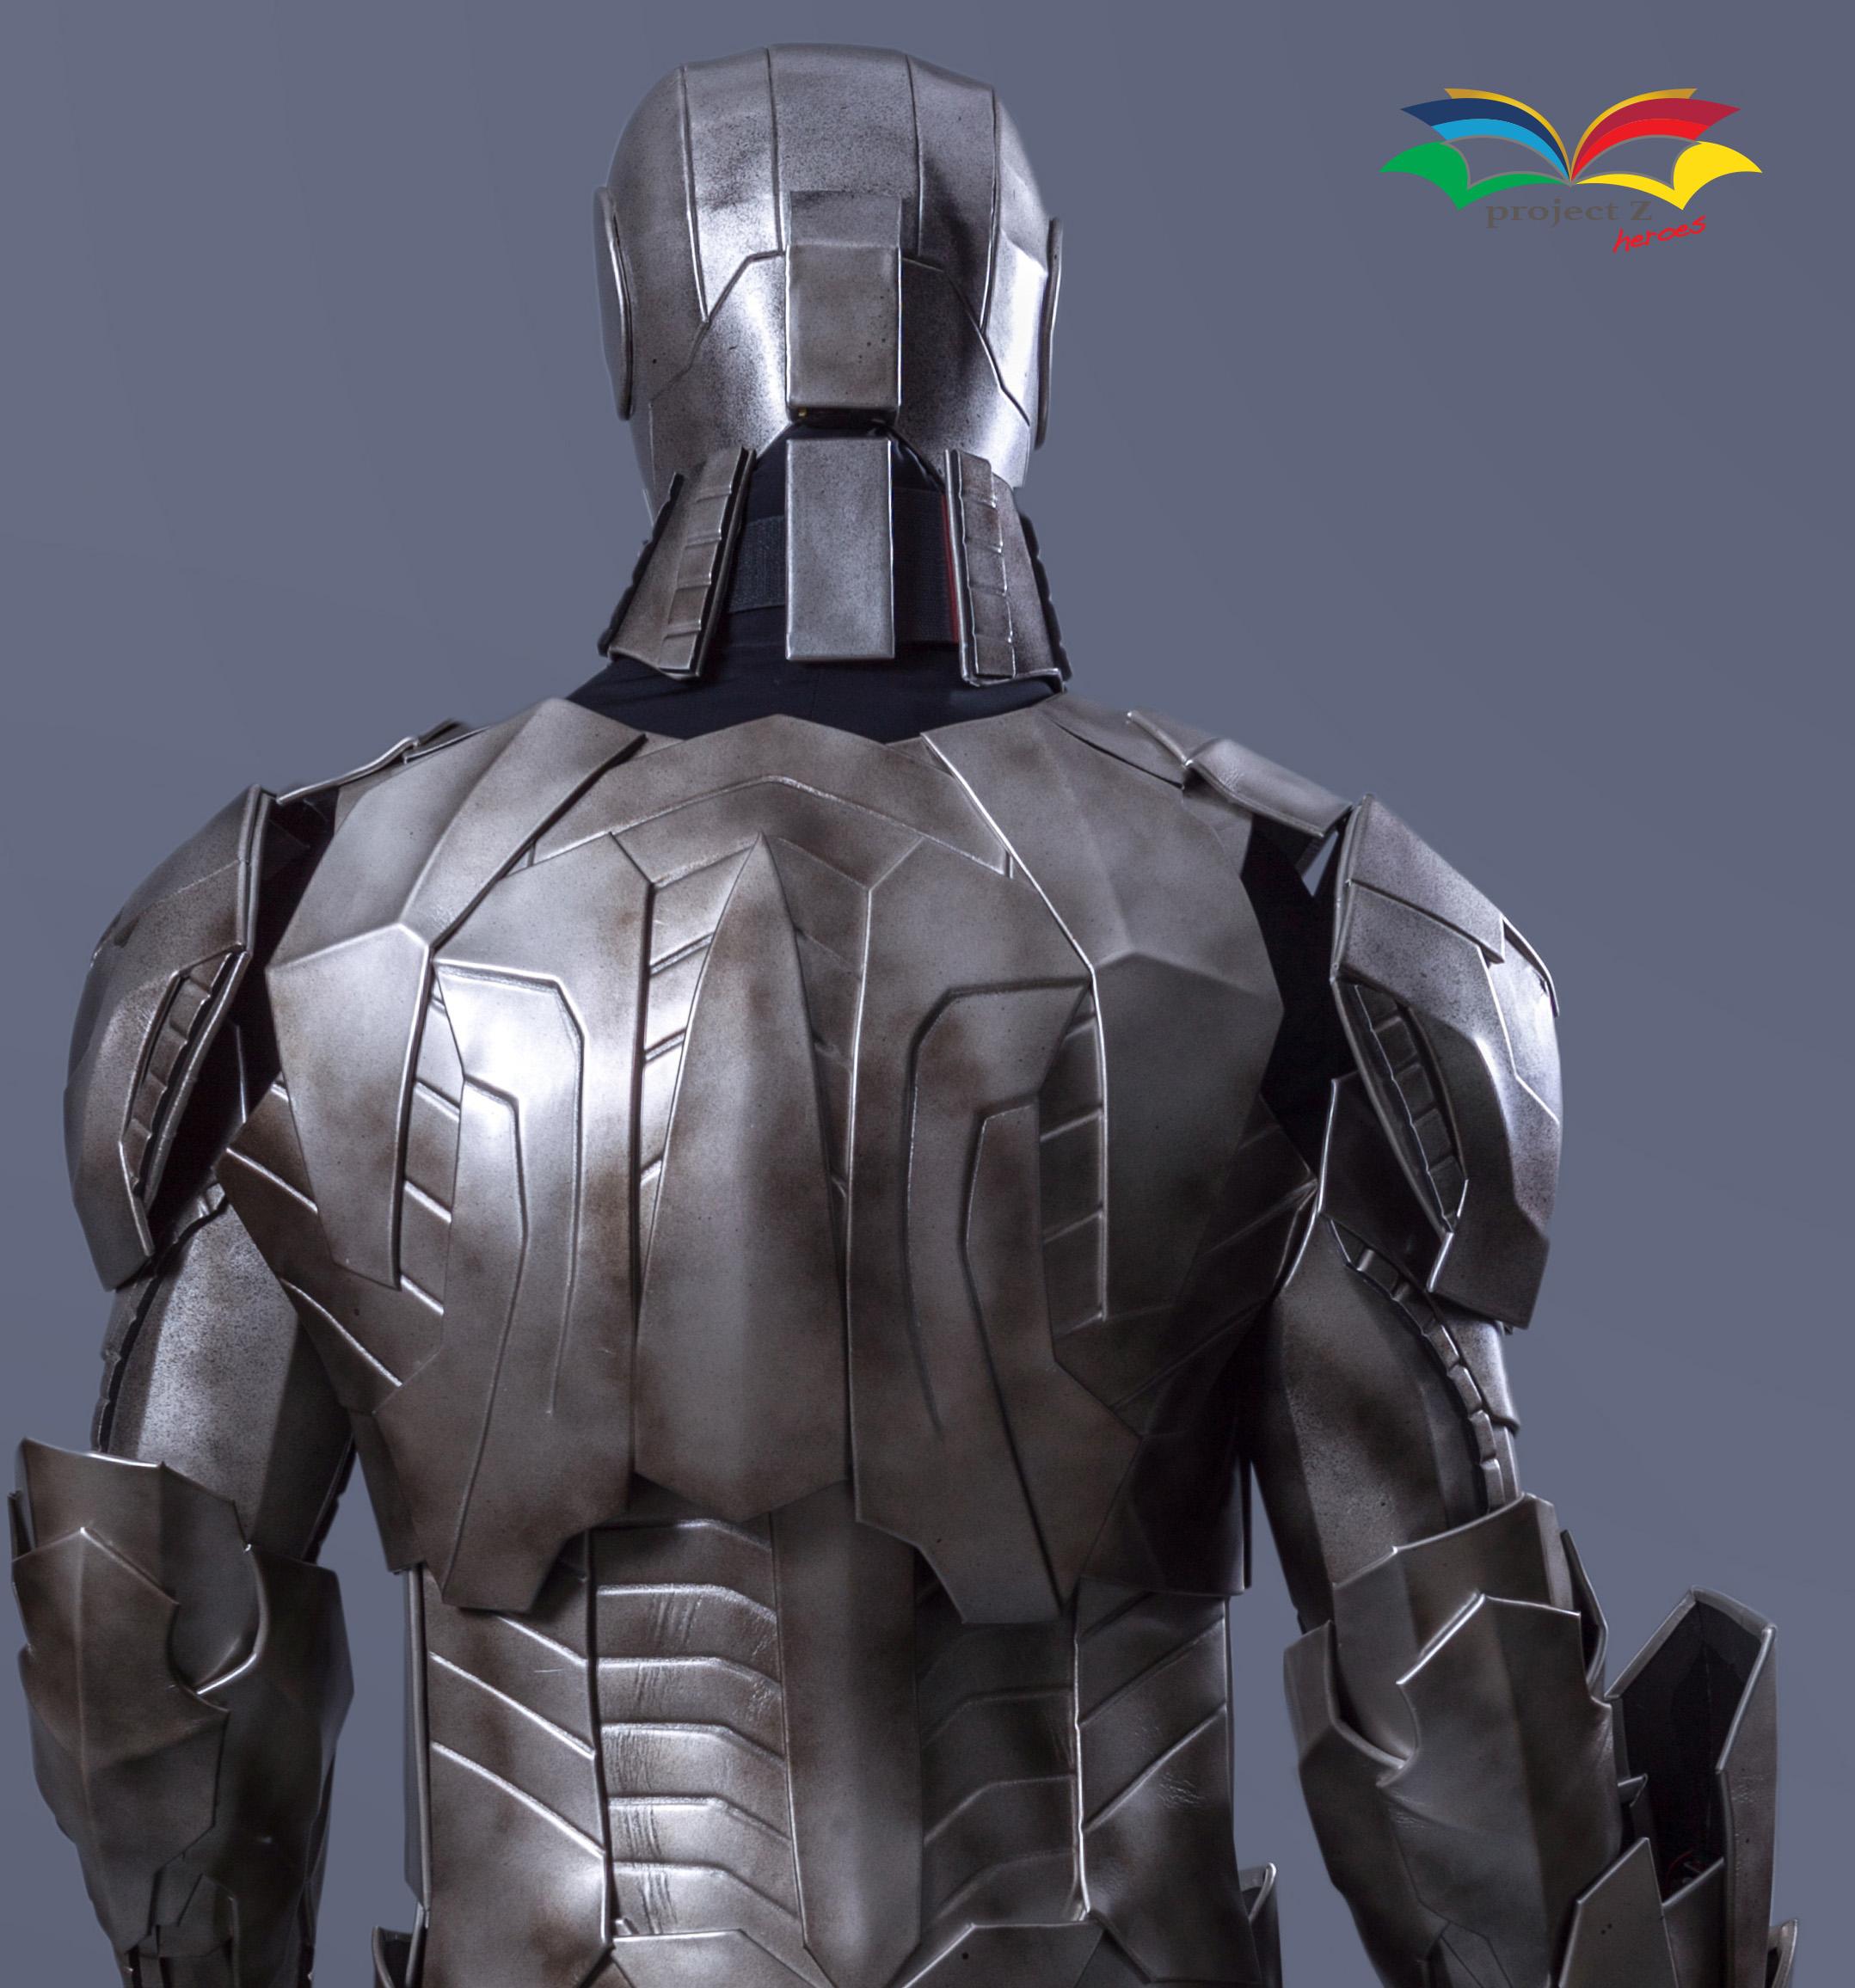 Cyborg costume backside closeup